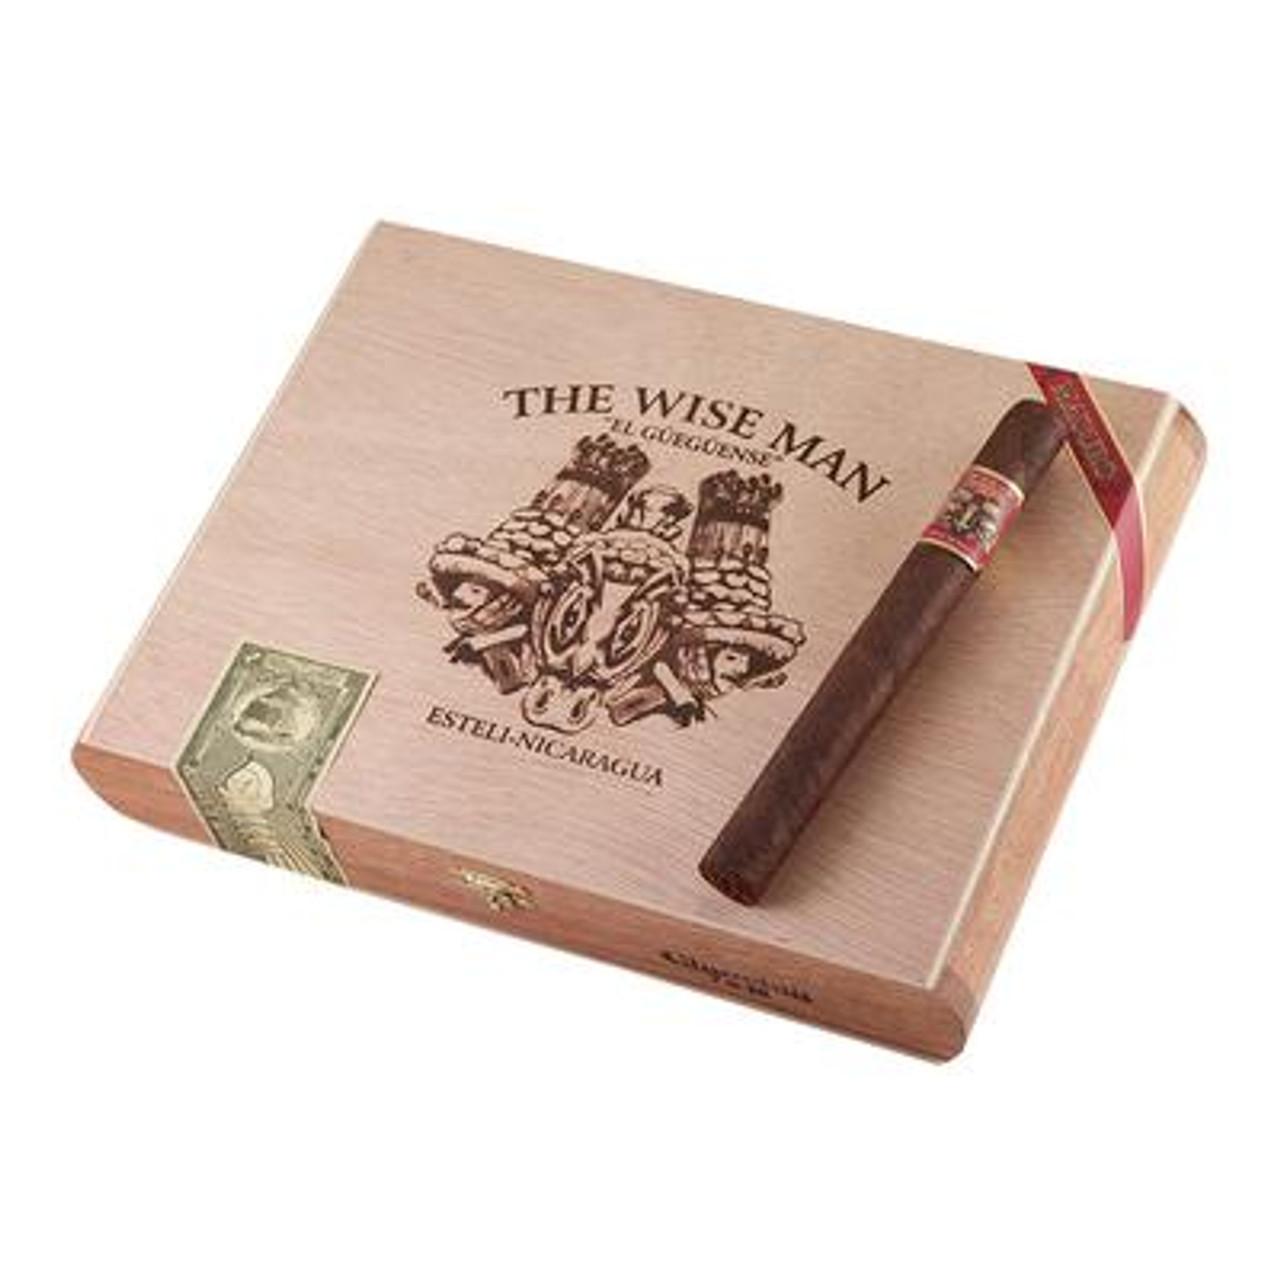 Foundation The Wise Man Maduro Churchill Cigars - 7 x 48 (Box of 25)